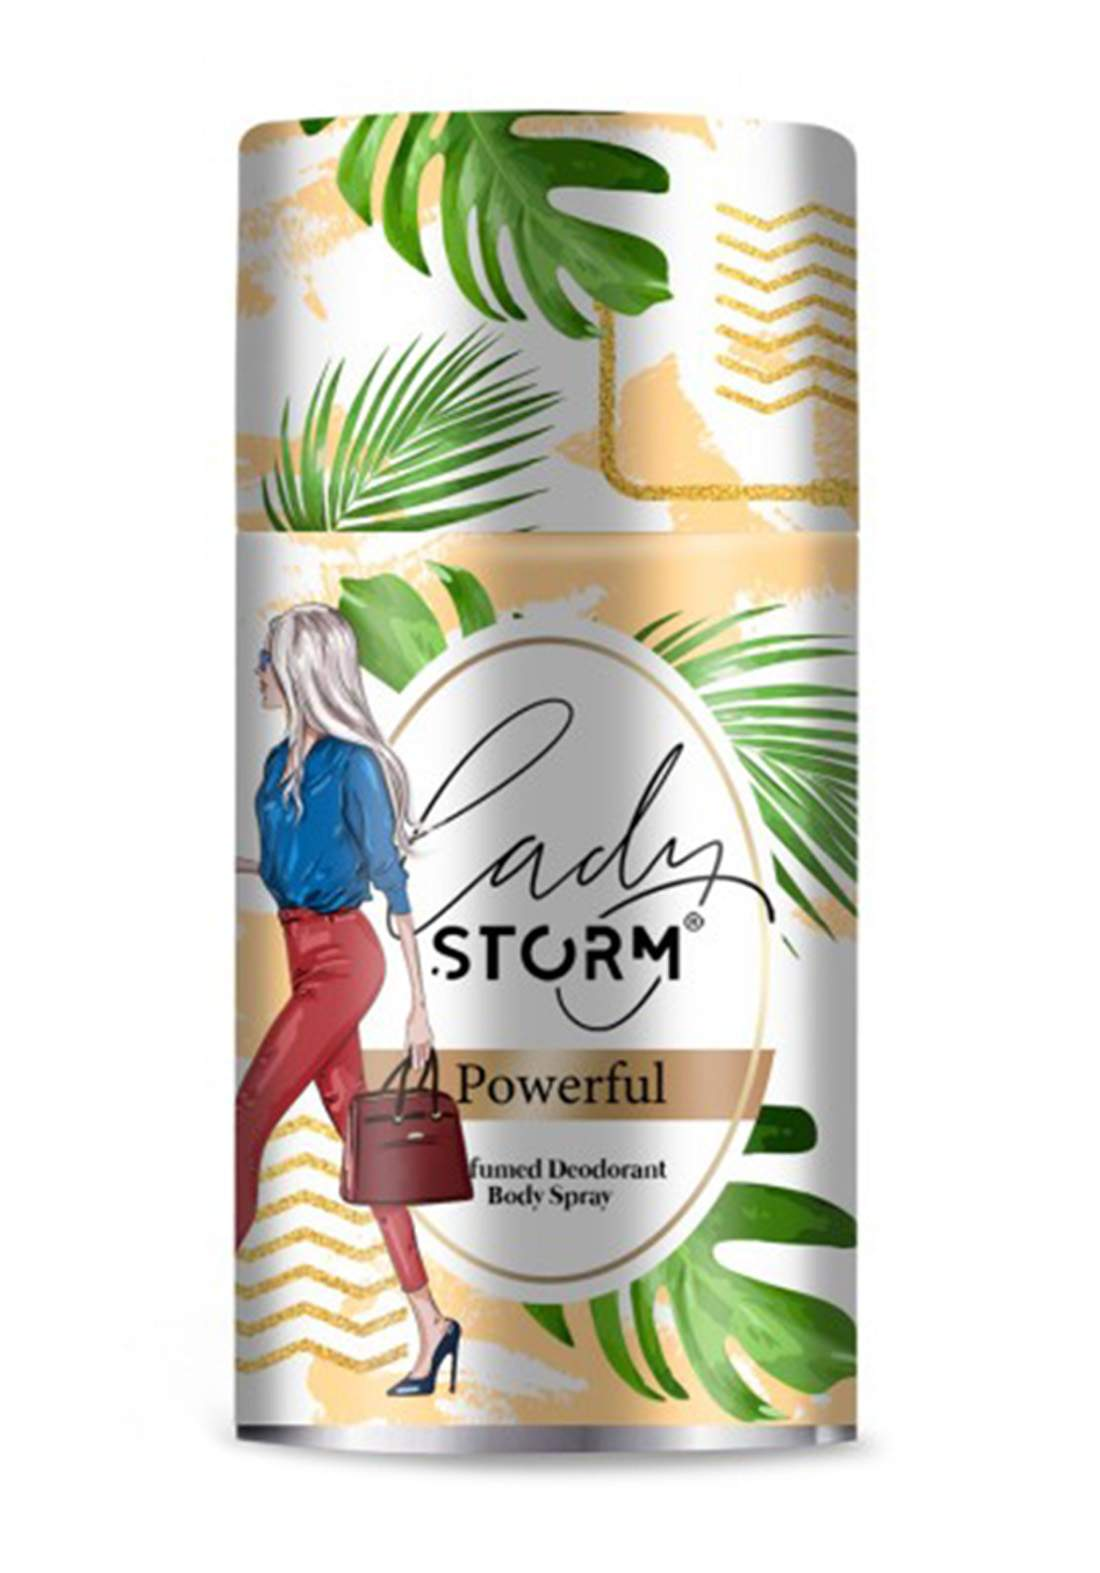 Storm Lady Perfumed Deodorant Body Spray -Pweful 250ml  مزيل العرق للنساء